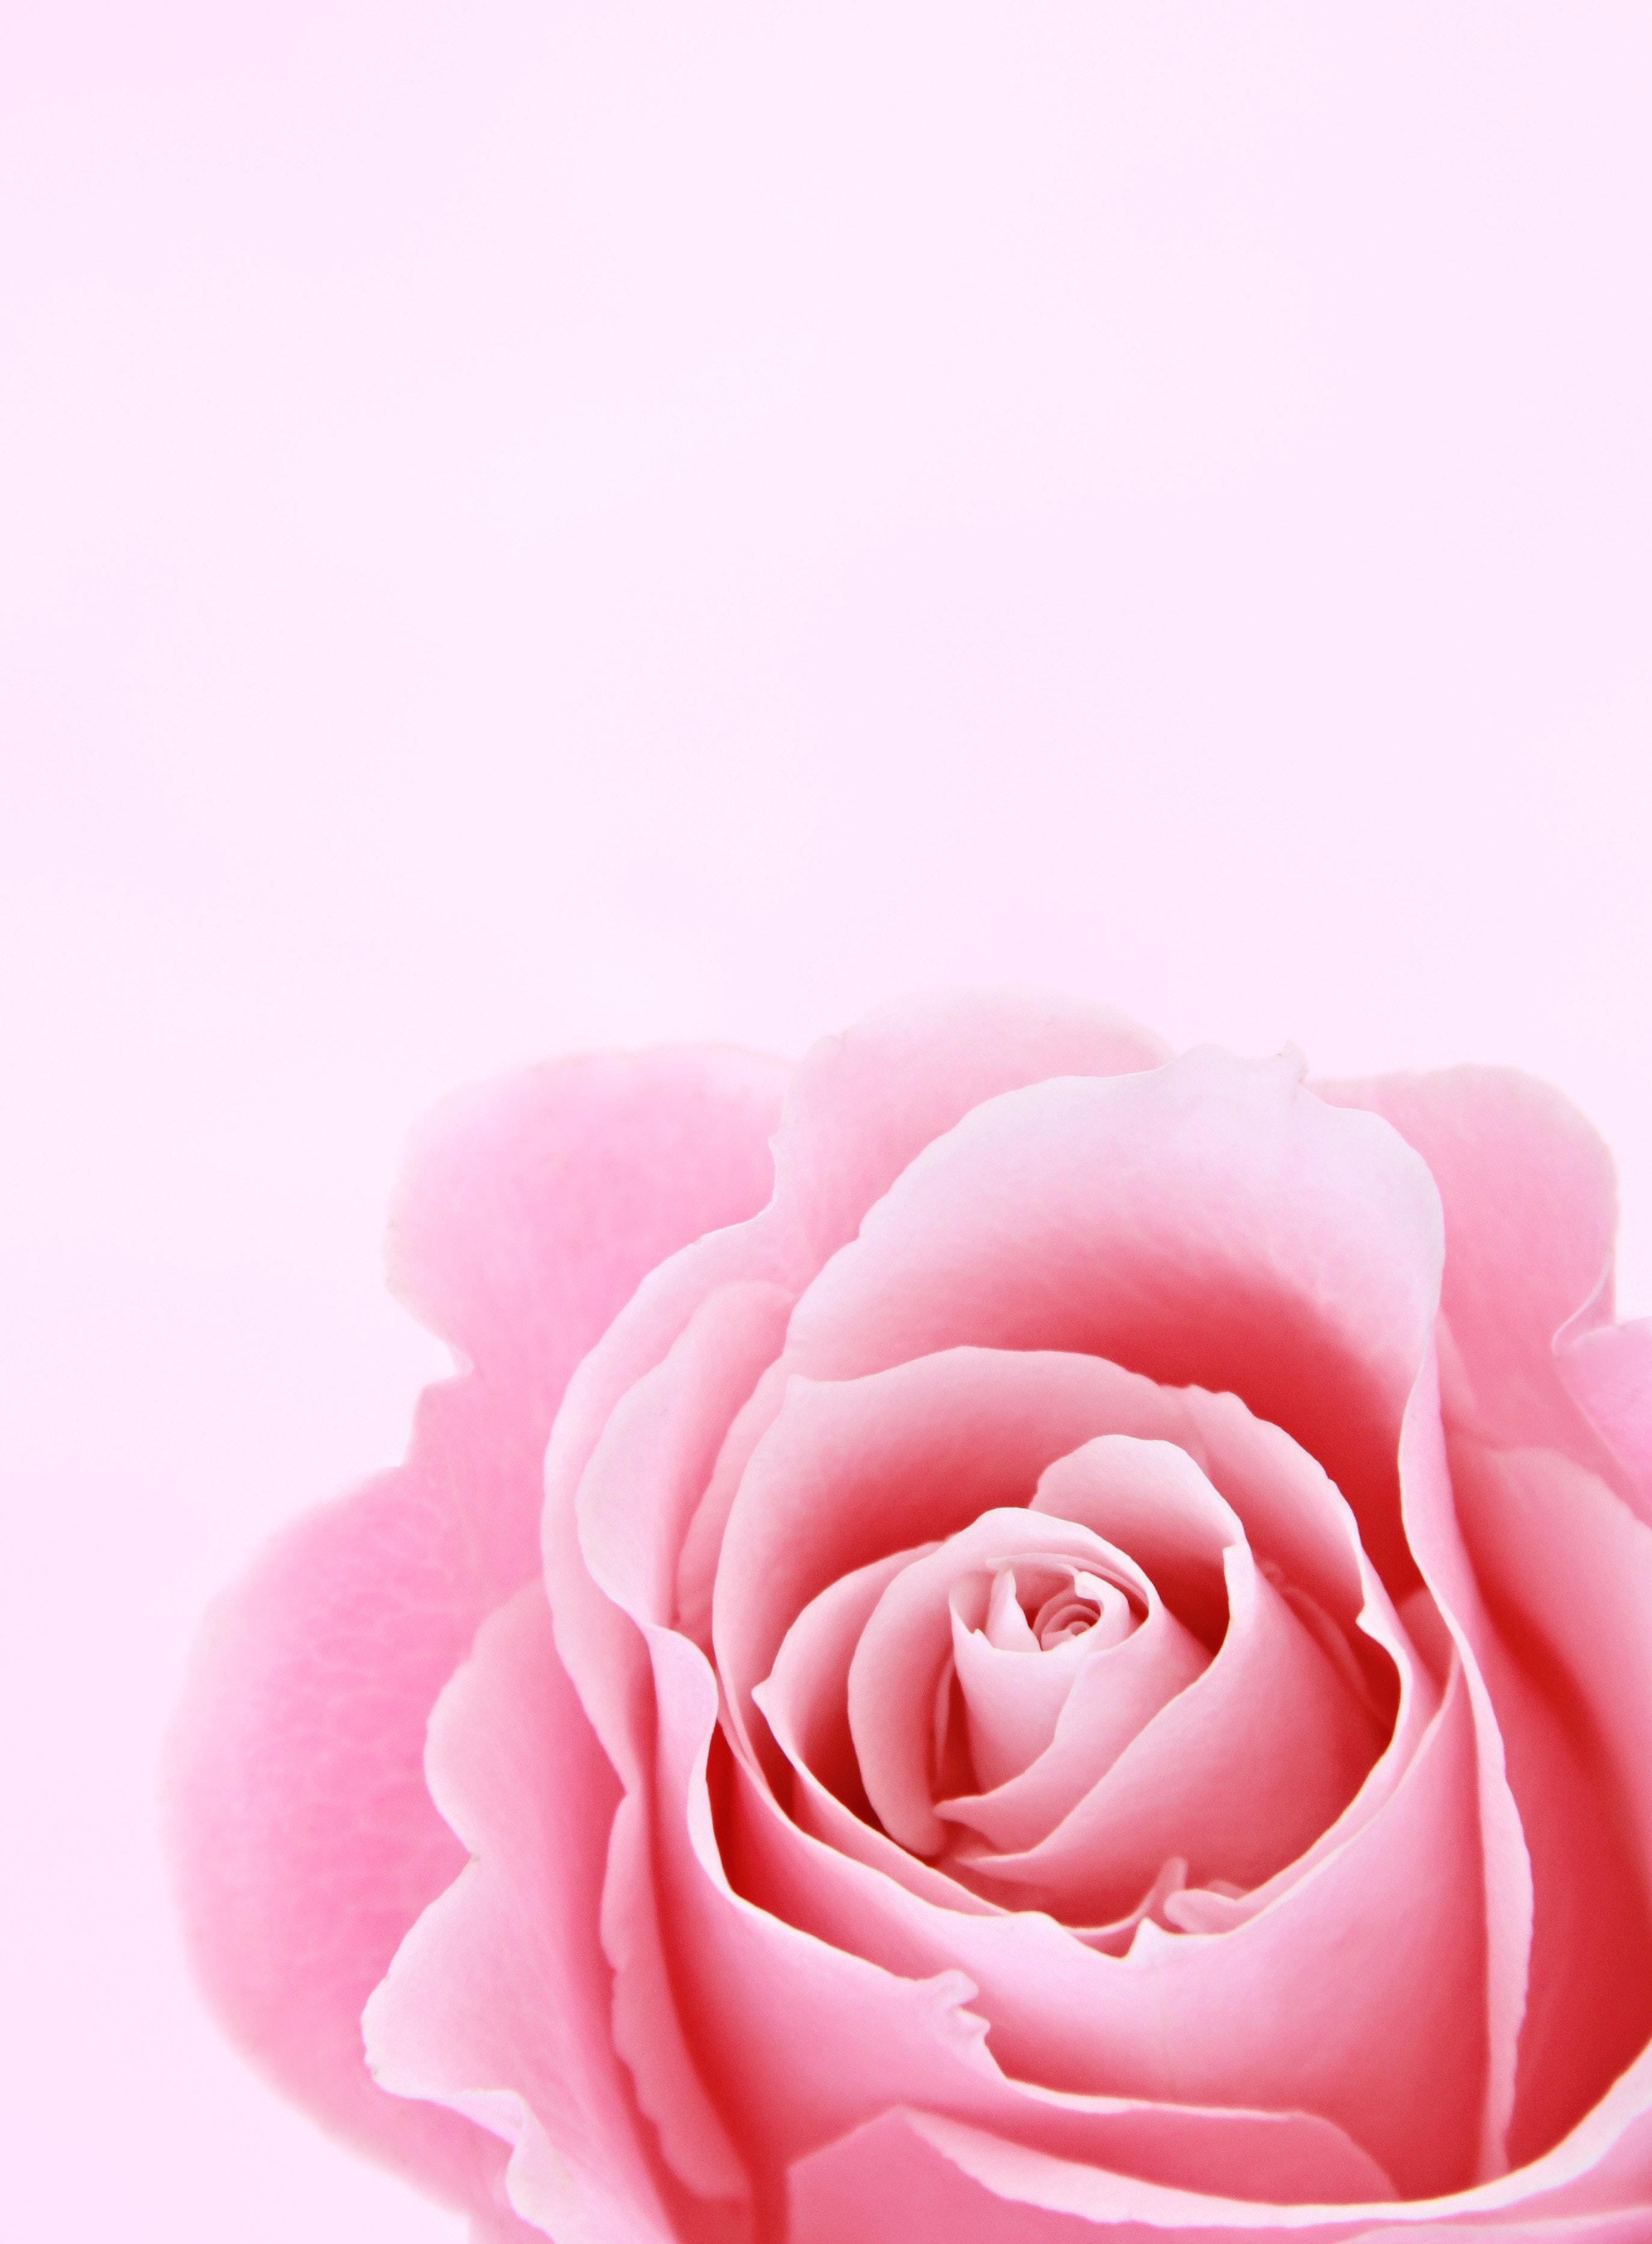 Pink Rose Closeup Photography Free Stock Photo